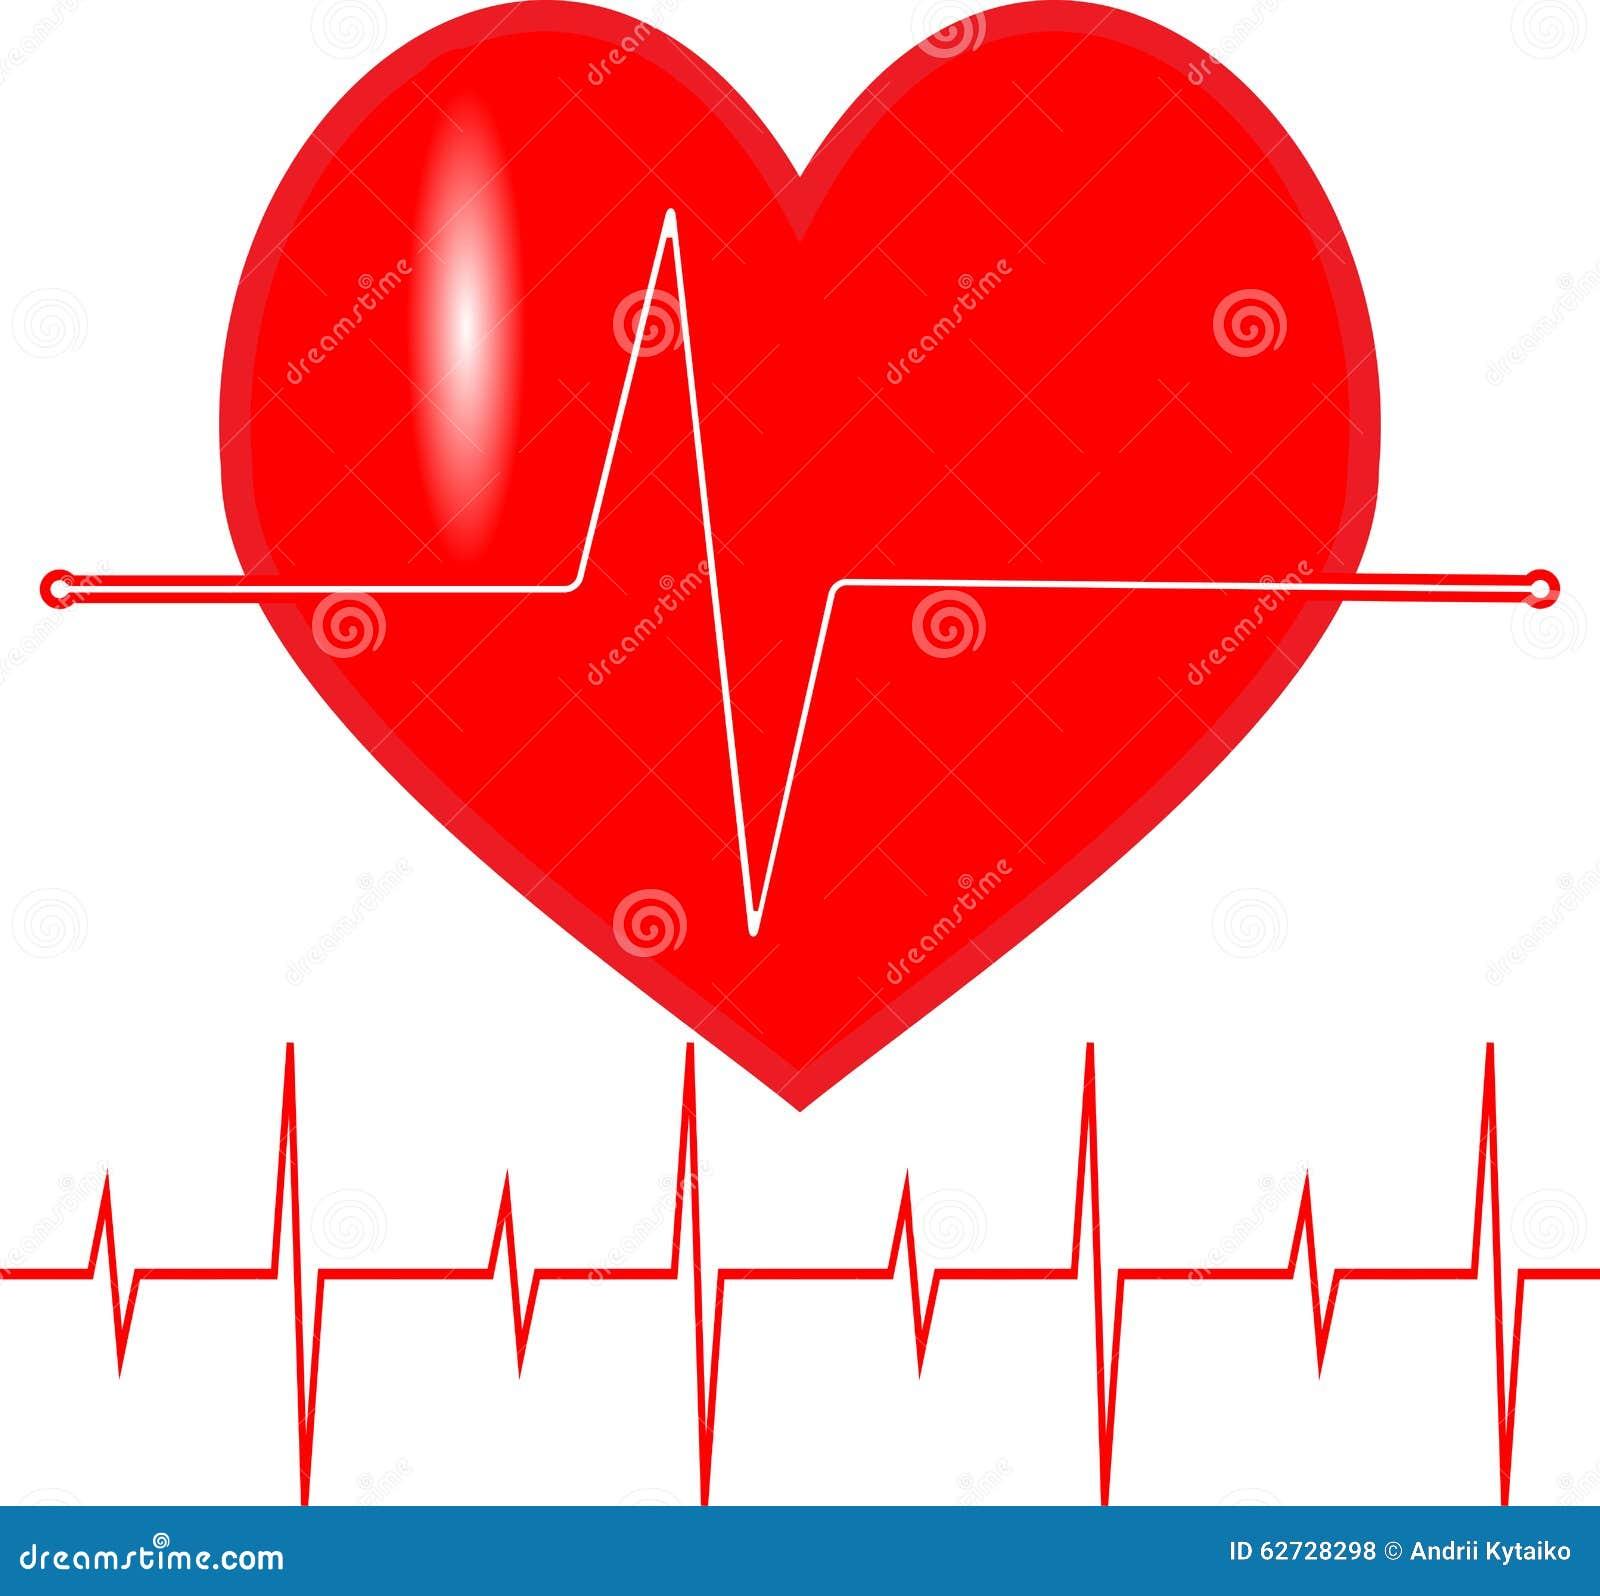 pulse heartbeat icon stock illustration illustration of design 62728298. Black Bedroom Furniture Sets. Home Design Ideas